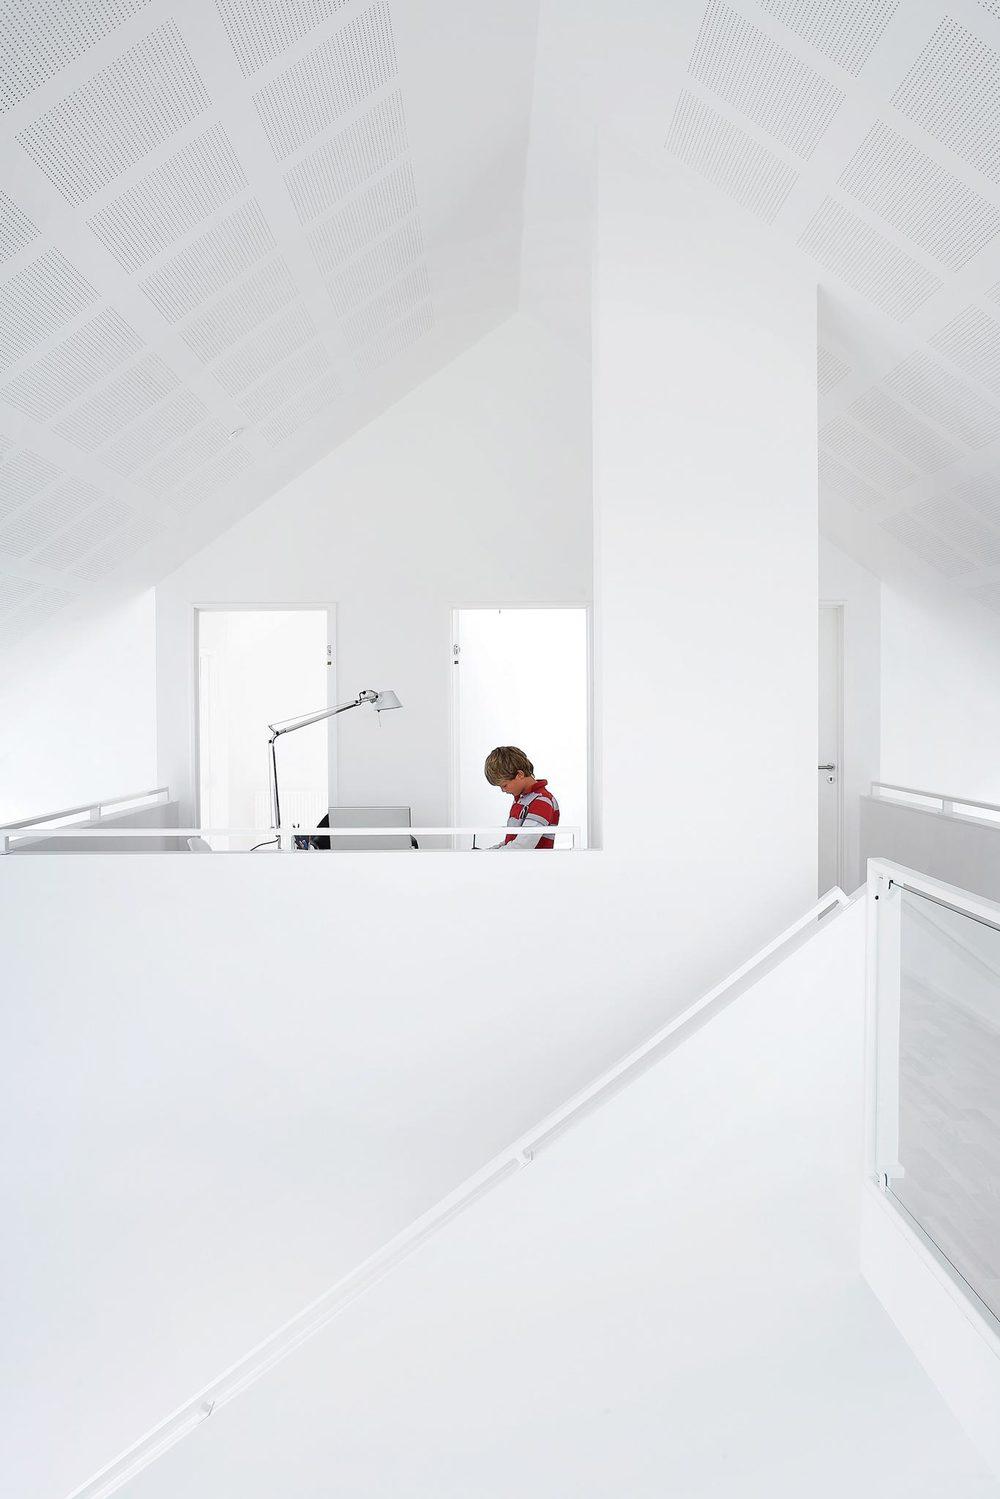 oneroom_arkitekttegnet_in_05.jpeg